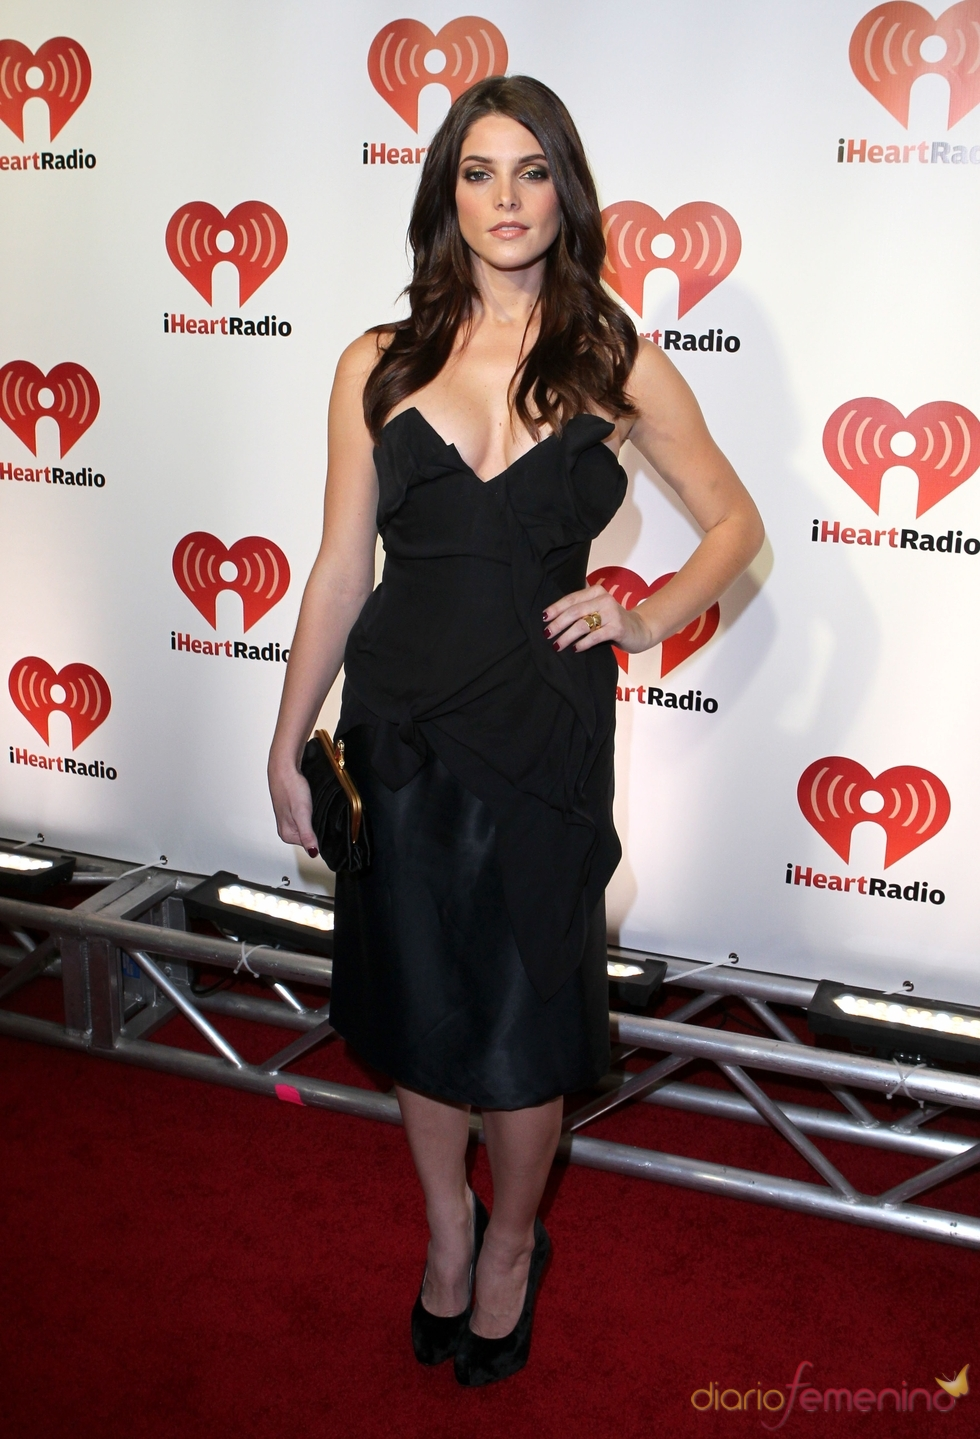 Ashley Greene en el iHeartRadio Music Festival